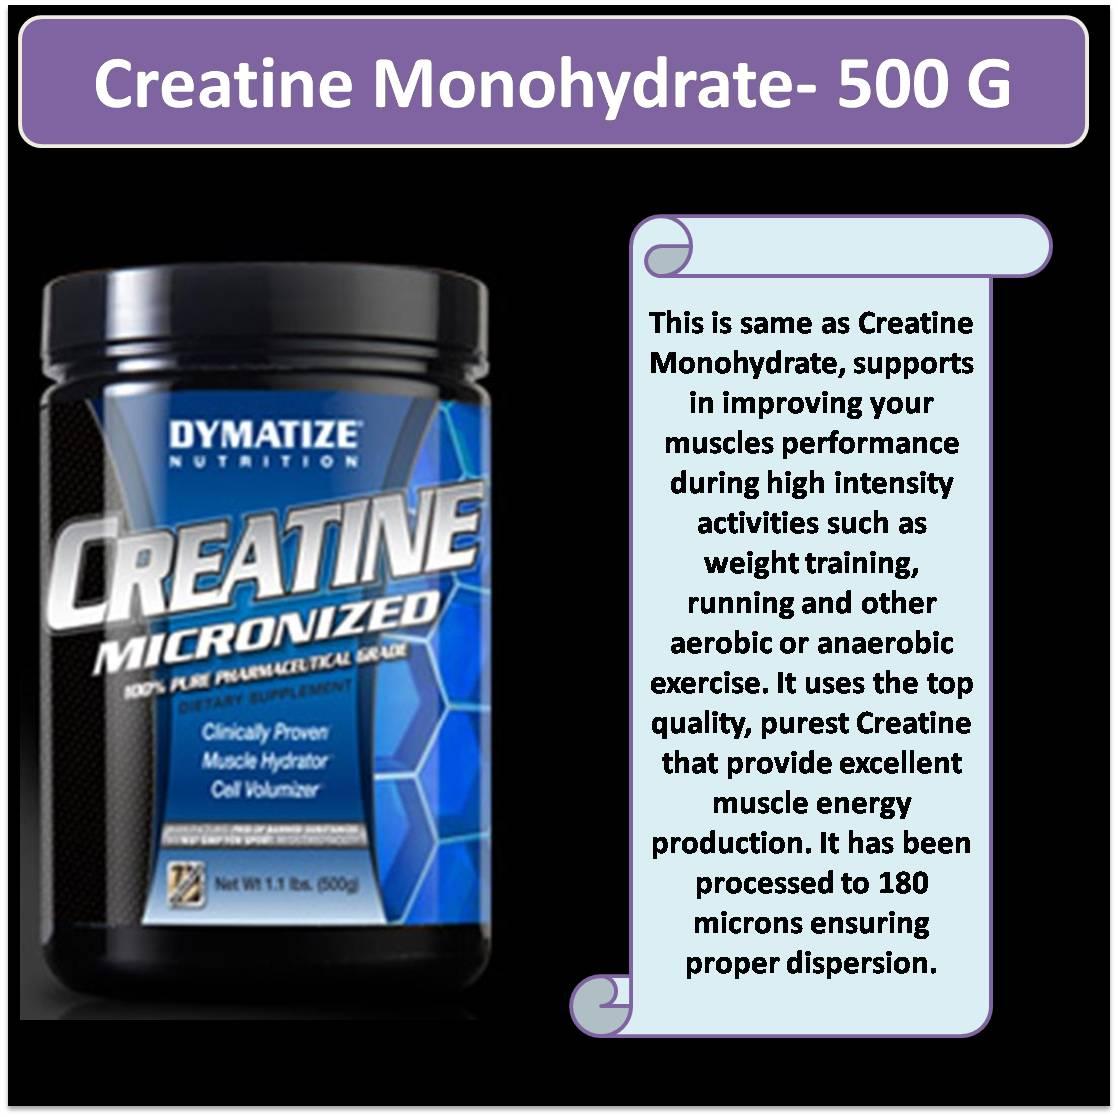 Creatine Monohydrate- 500 G